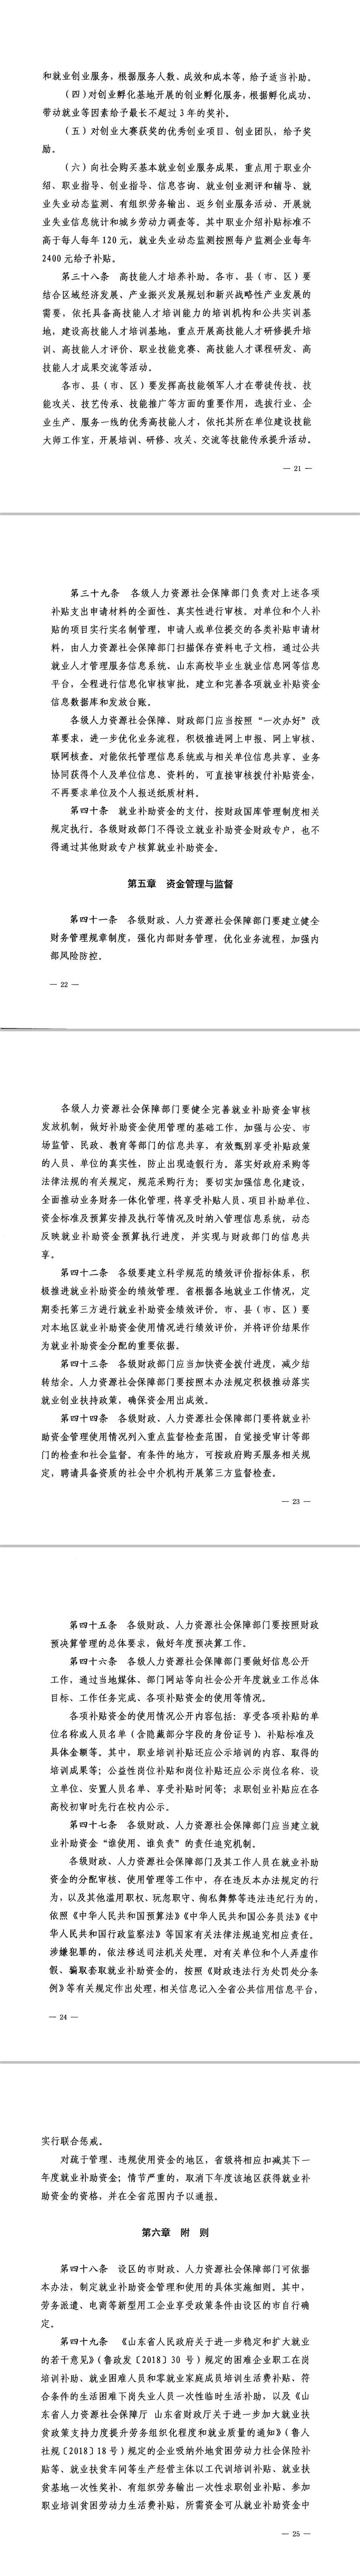 文件一(21-25).png